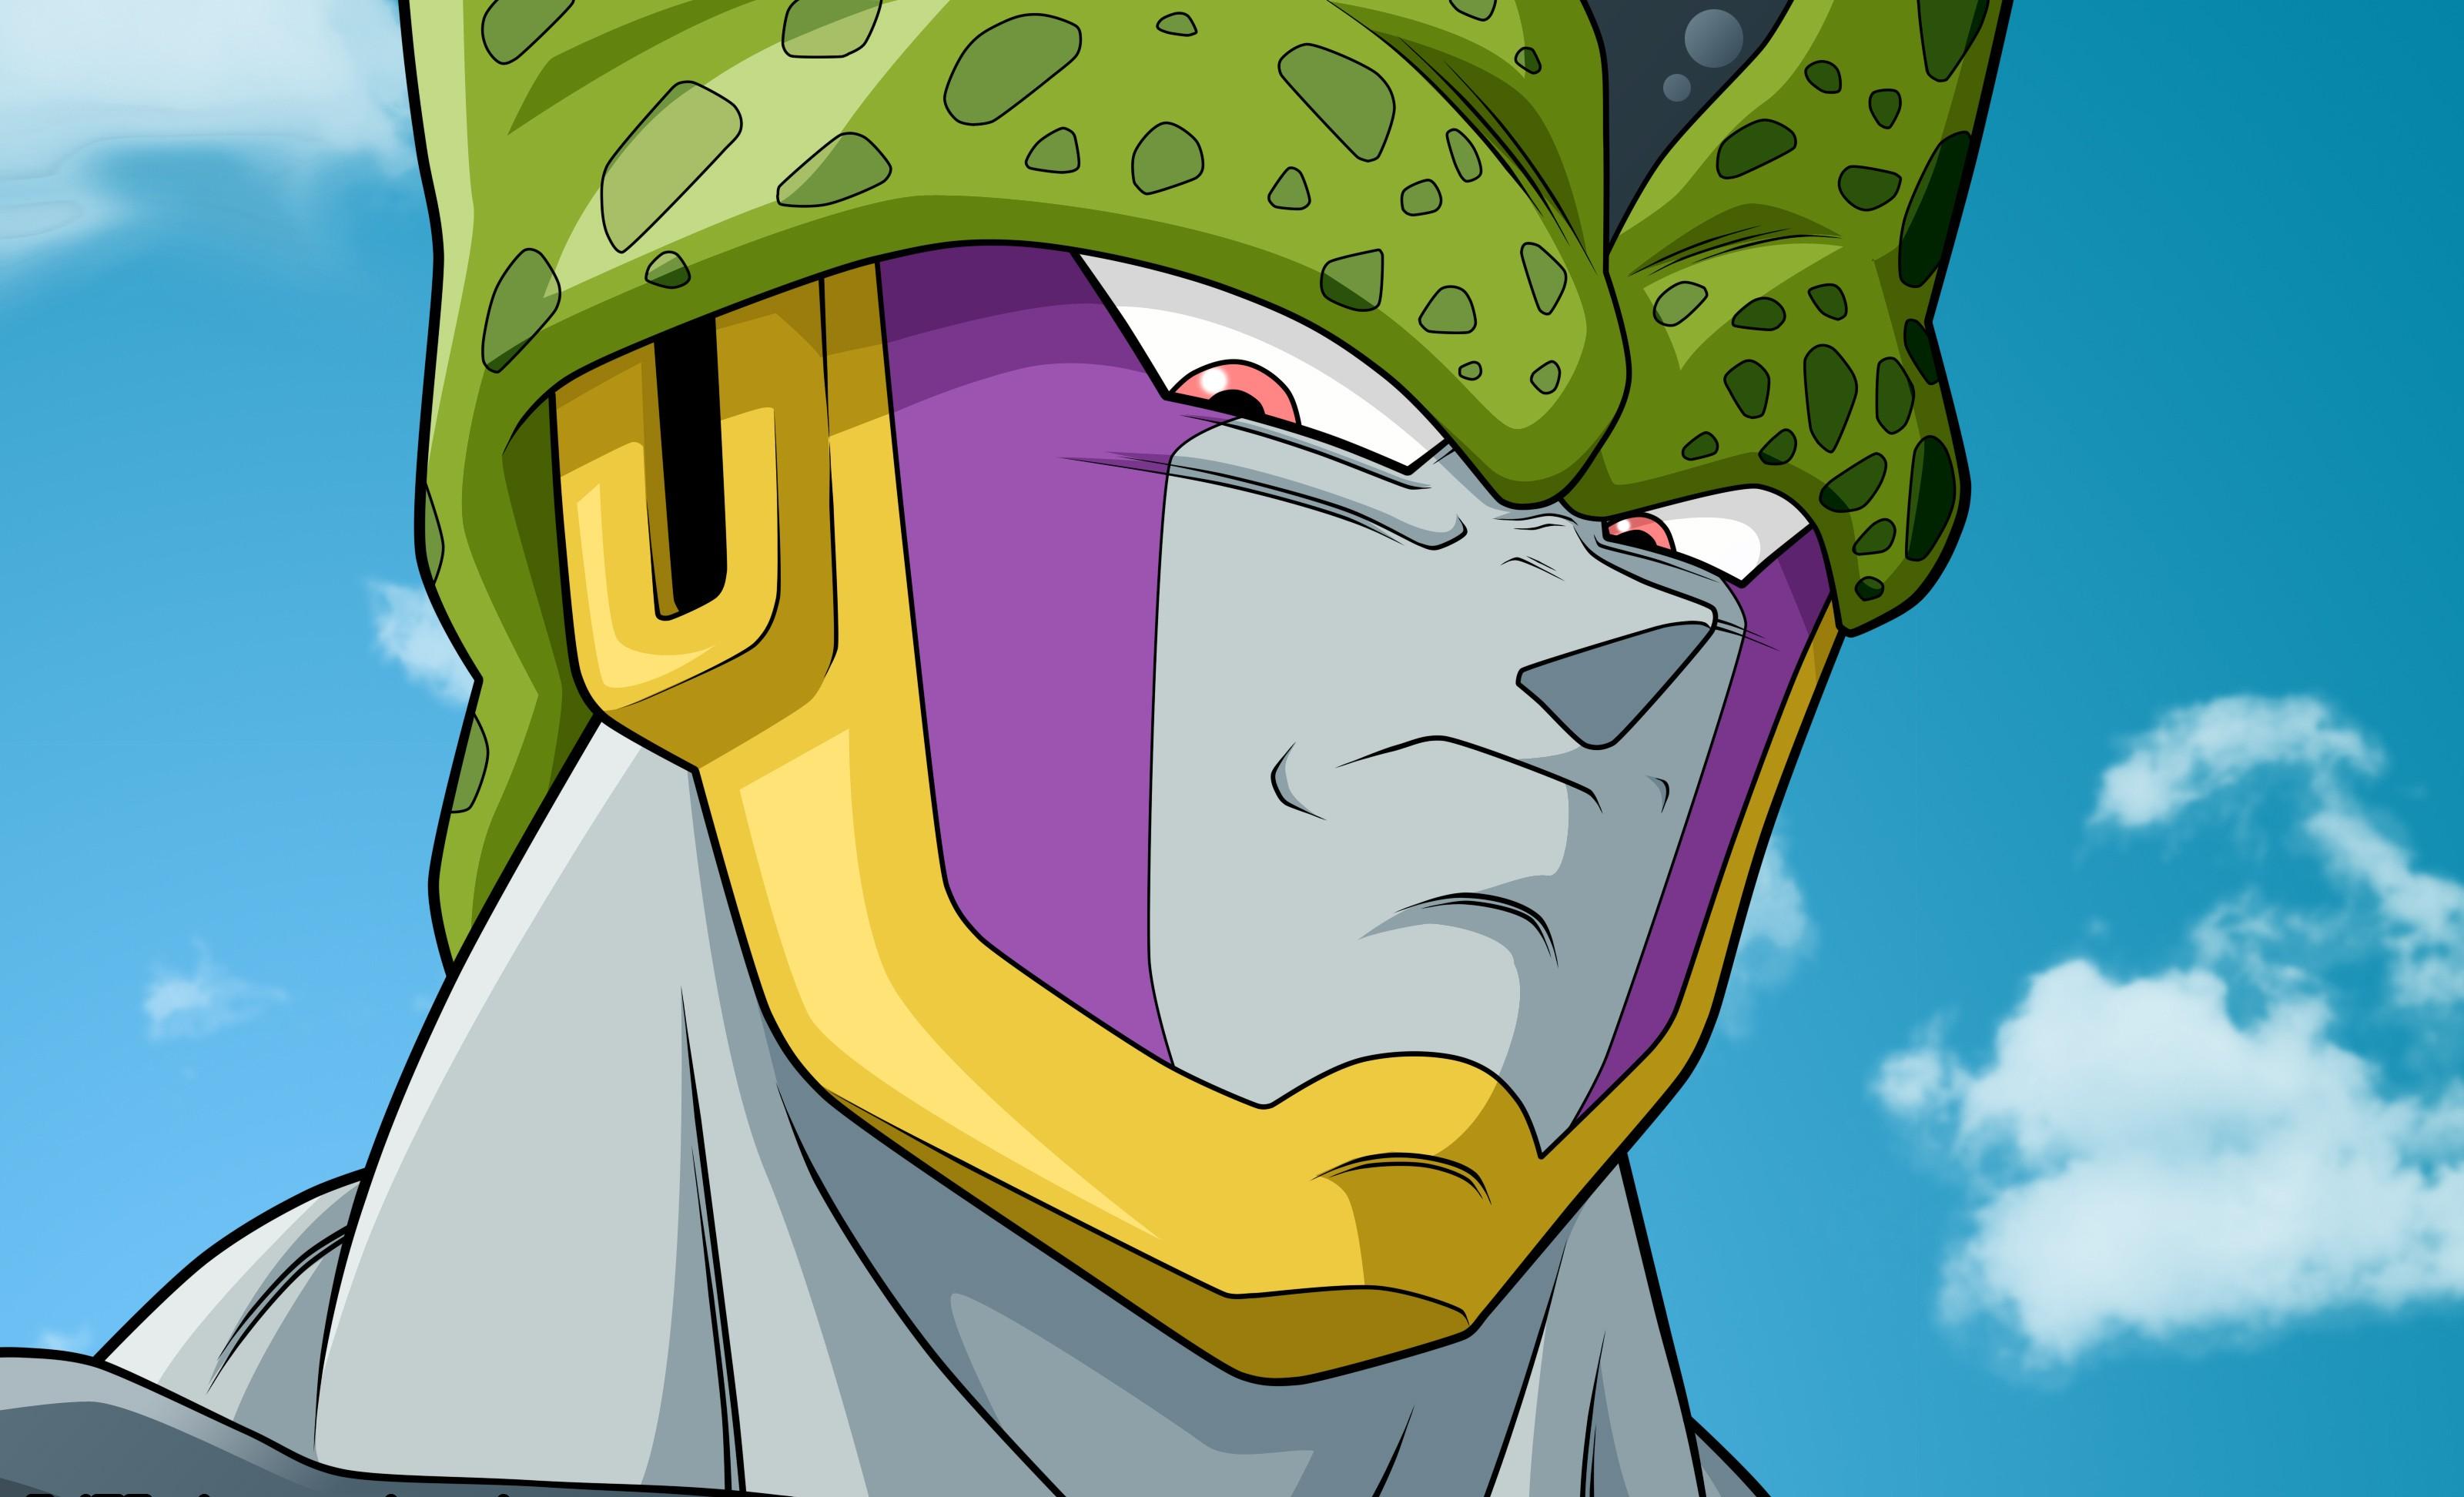 Fond d'écran : illustration, Anime, dessin animé, Dragon Ball, Dragon Ball Z, ART, capture d ...